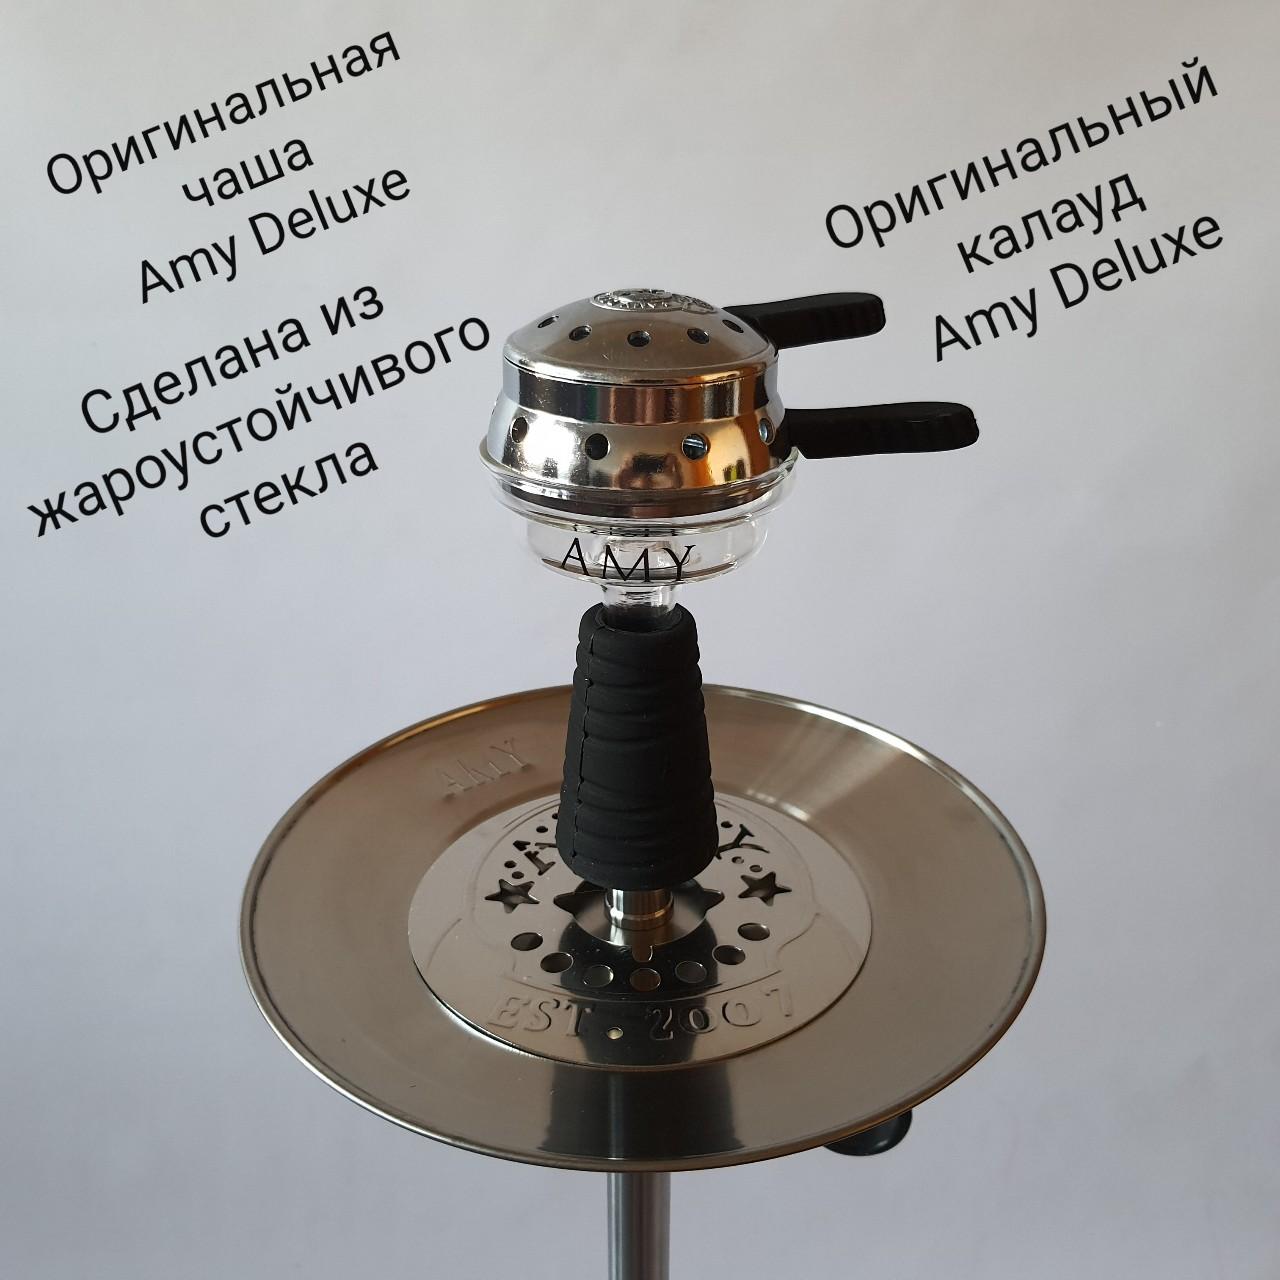 Оригинальный калауд Amy Deluxe и чаша из жароустойчивого стекла 09